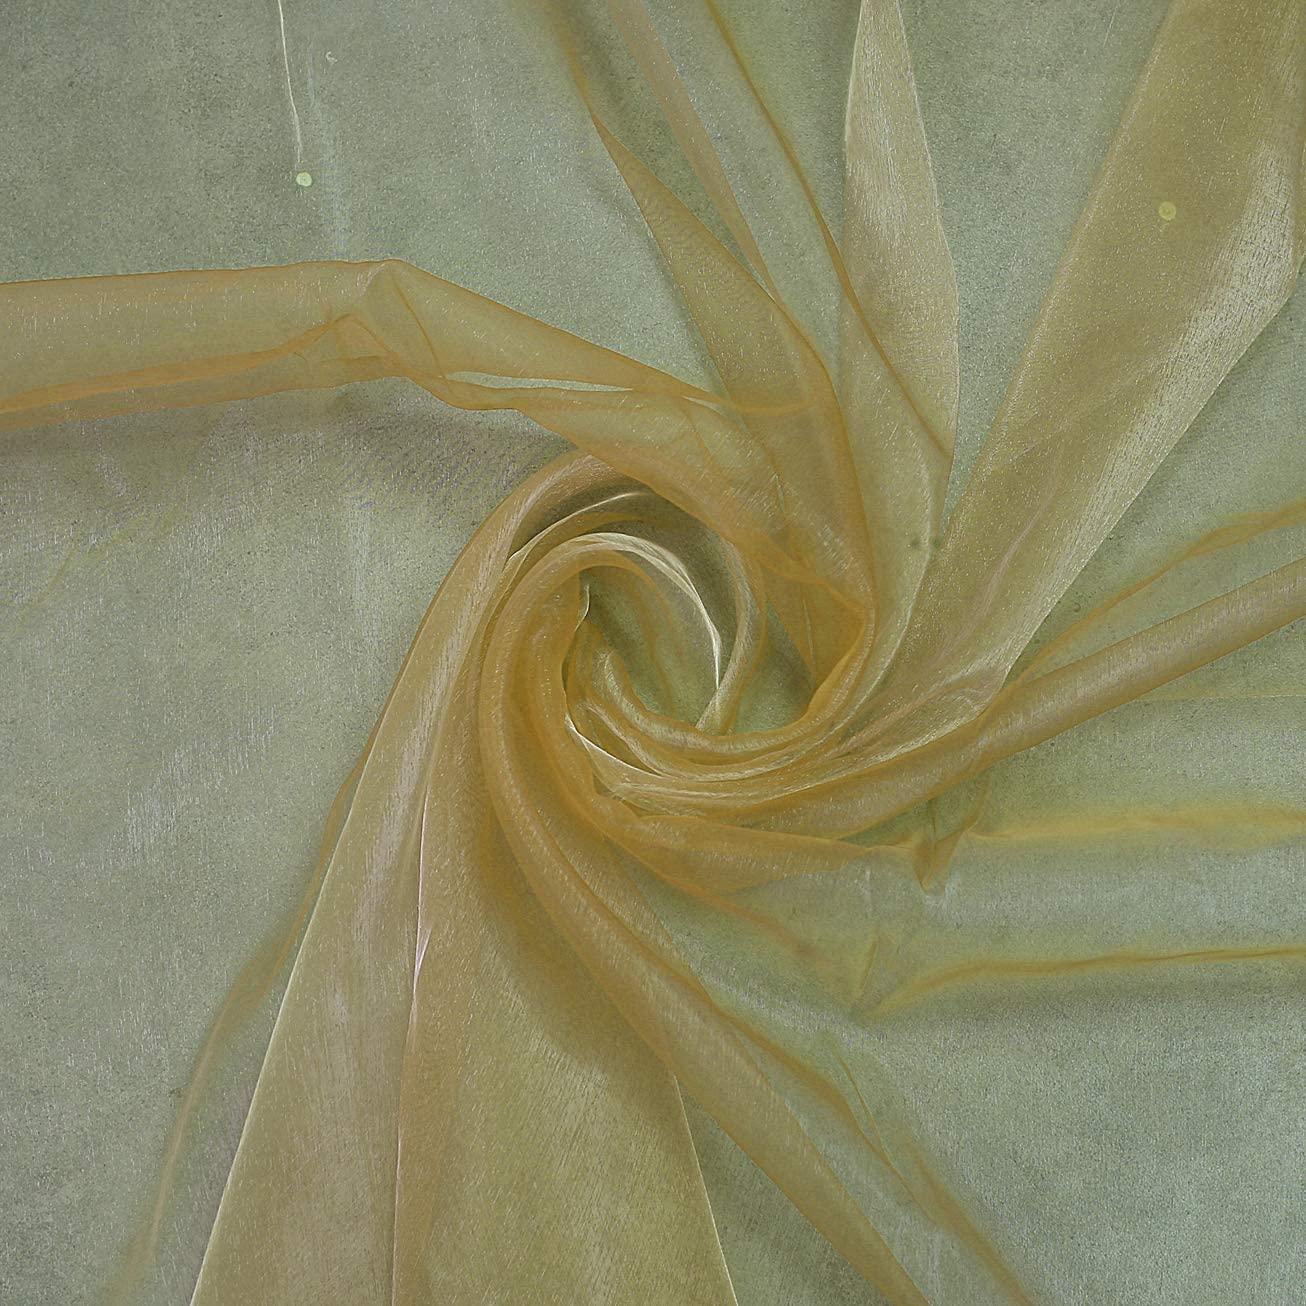 "mds Pack of 5 Yard Bridal Solid Sheer Organza Fabric Bolt for Wedding Dress,Fashion, Crafts, Decorations Silky Shiny Organza 44""- Champagne Gold"